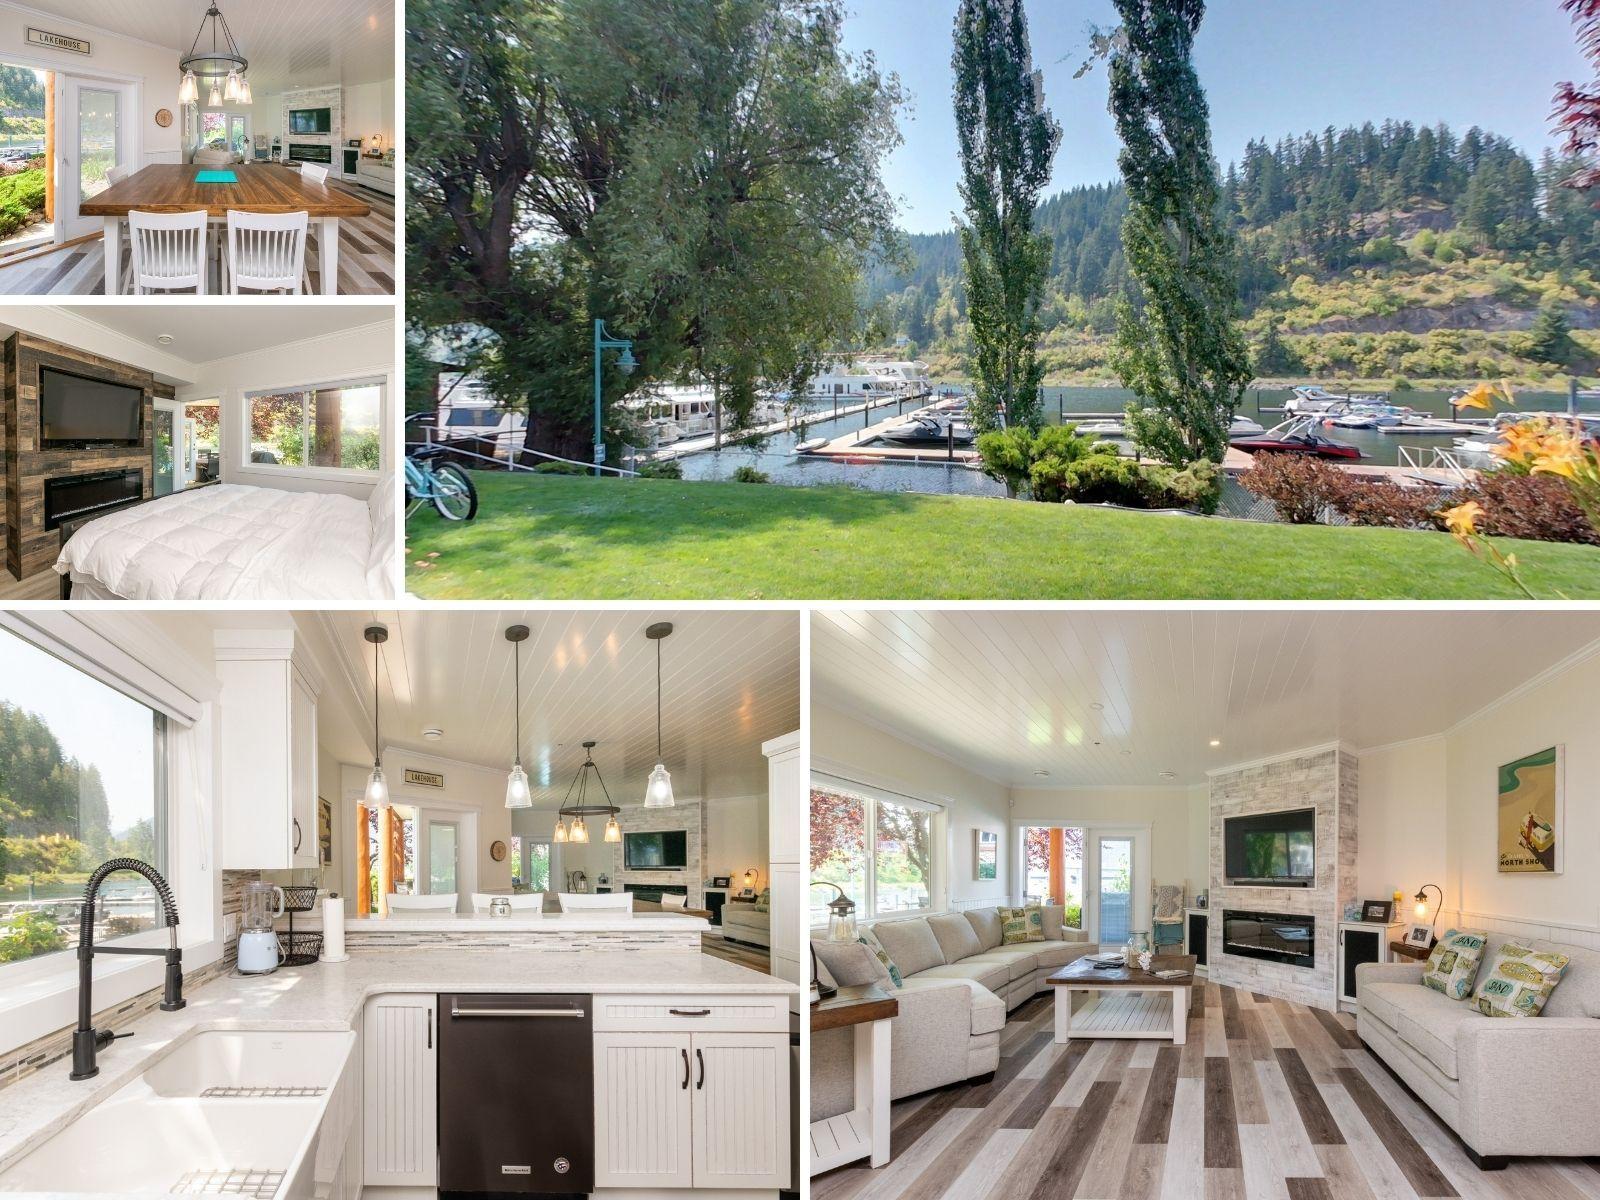 Main Photo: D104 1118 Riverside Avenue in Sicamous: House for sale (Mara Lake)  : MLS®# 10235714